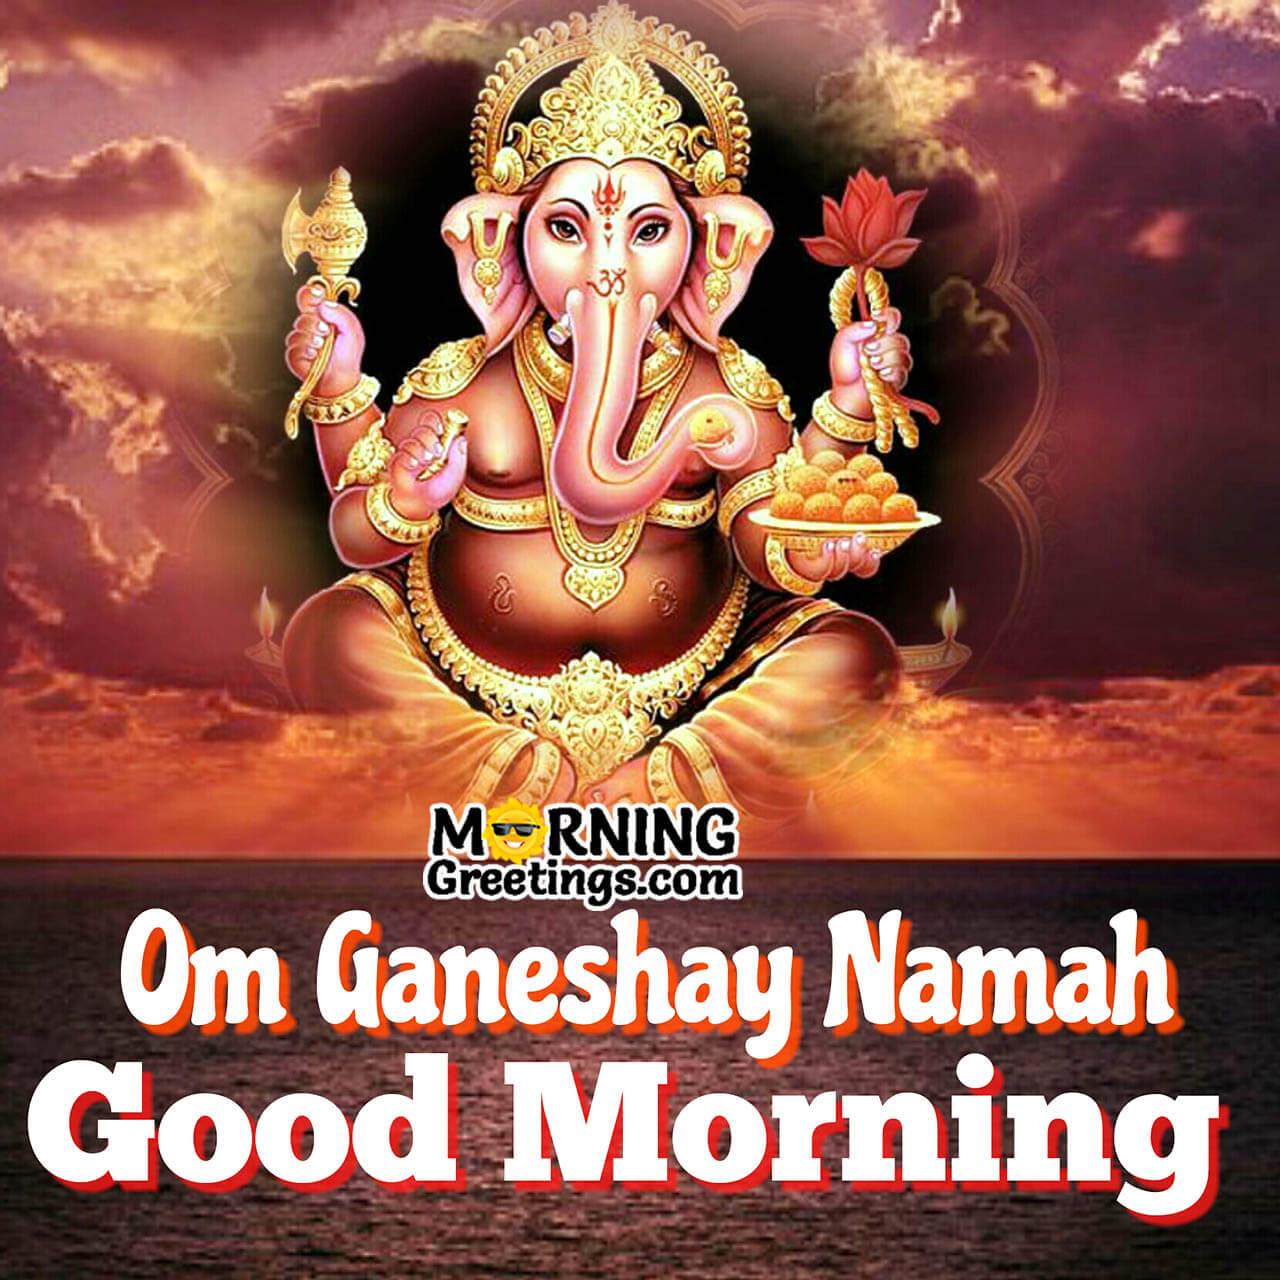 Matchmaking online Ganesha